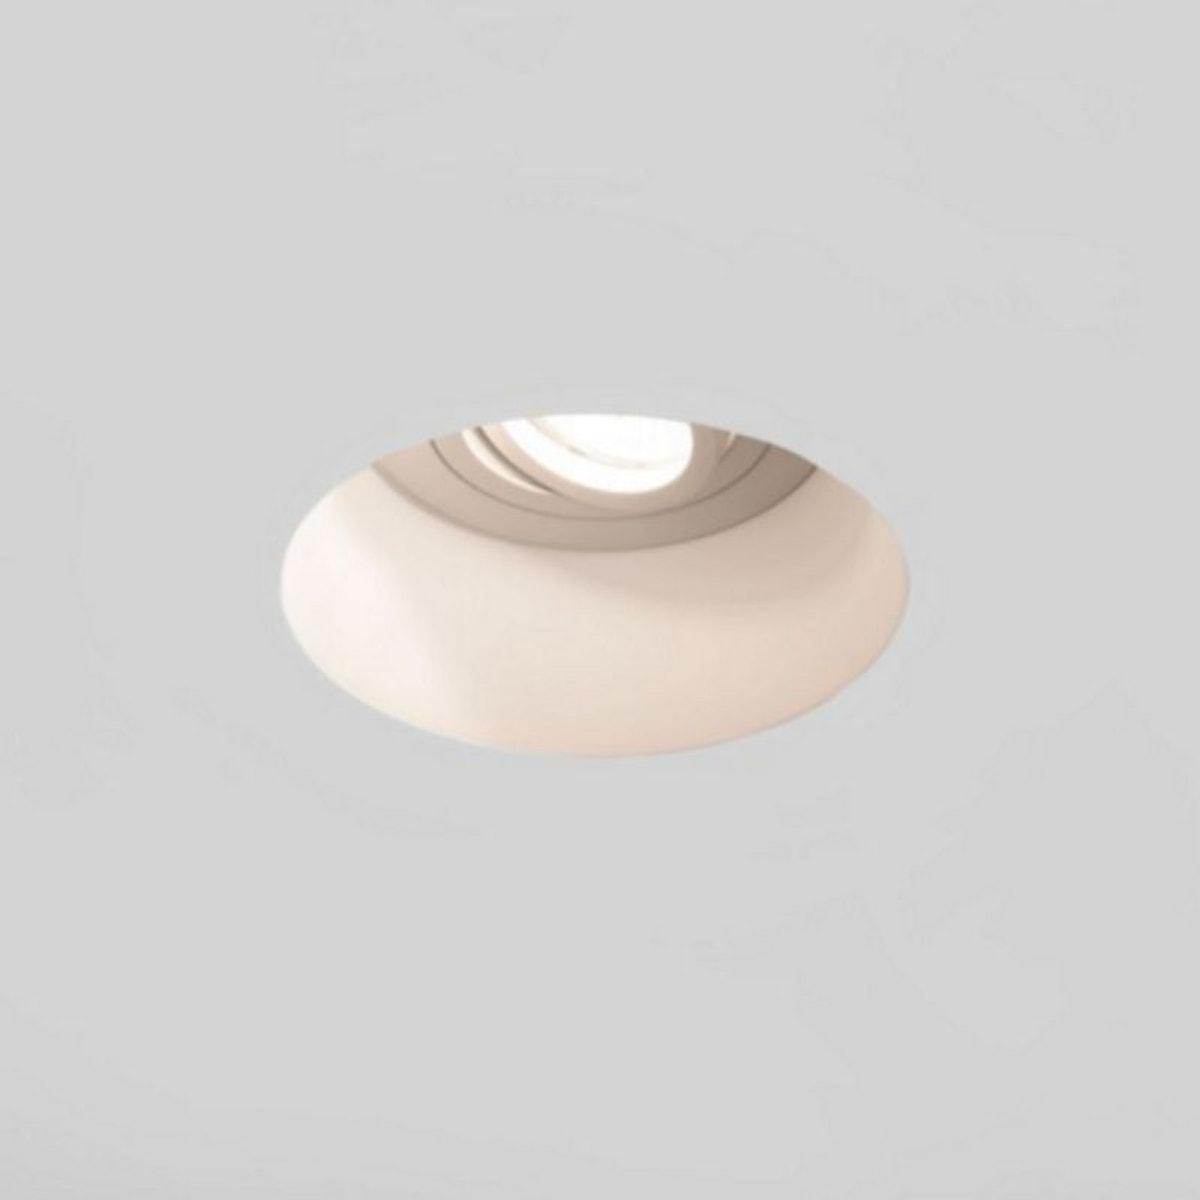 Basse Tension Salle De Bain spot encastrable rond orientable blanco - taille : taille